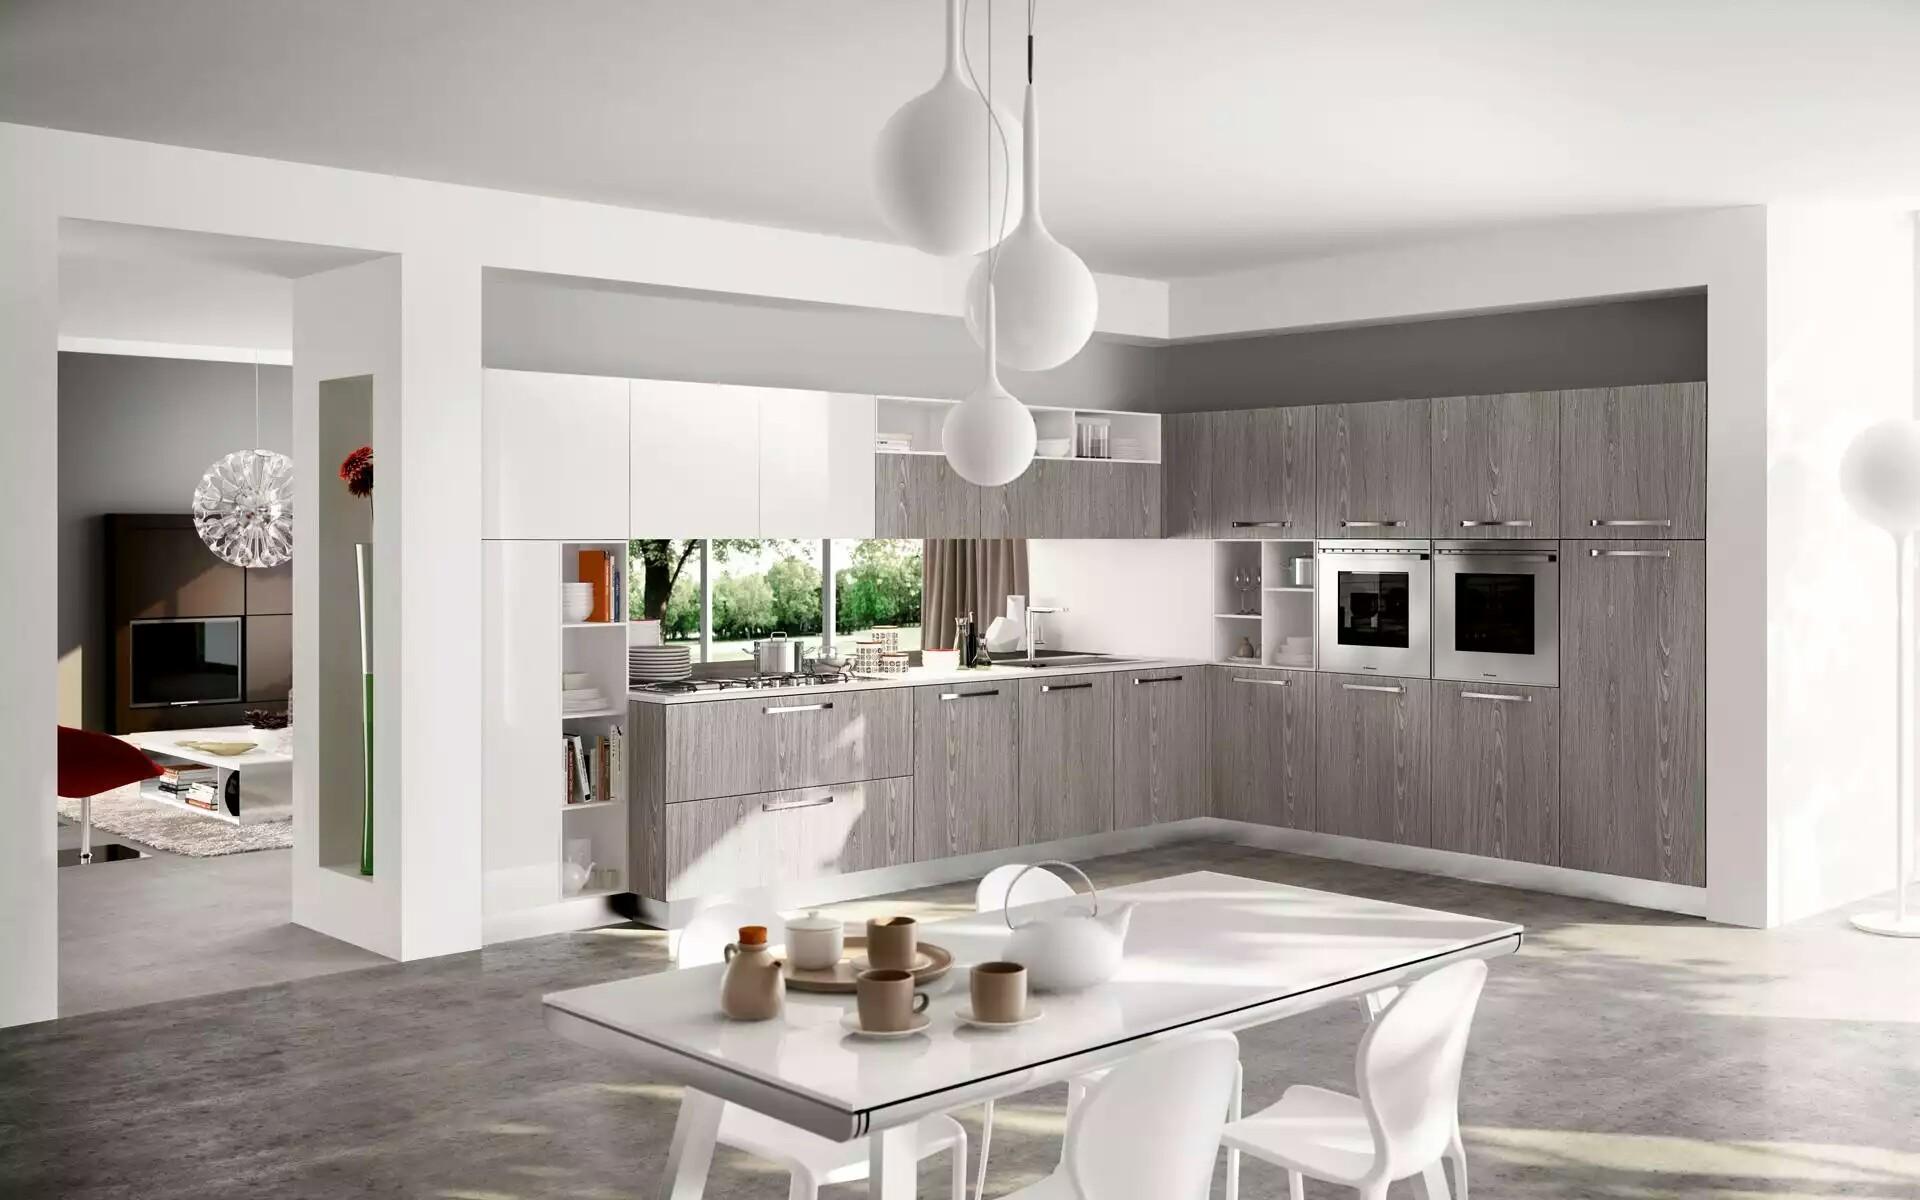 Bright and Sunny Kitchen Design ideas | My Decorative on Modern Kitchen Design Ideas  id=49773